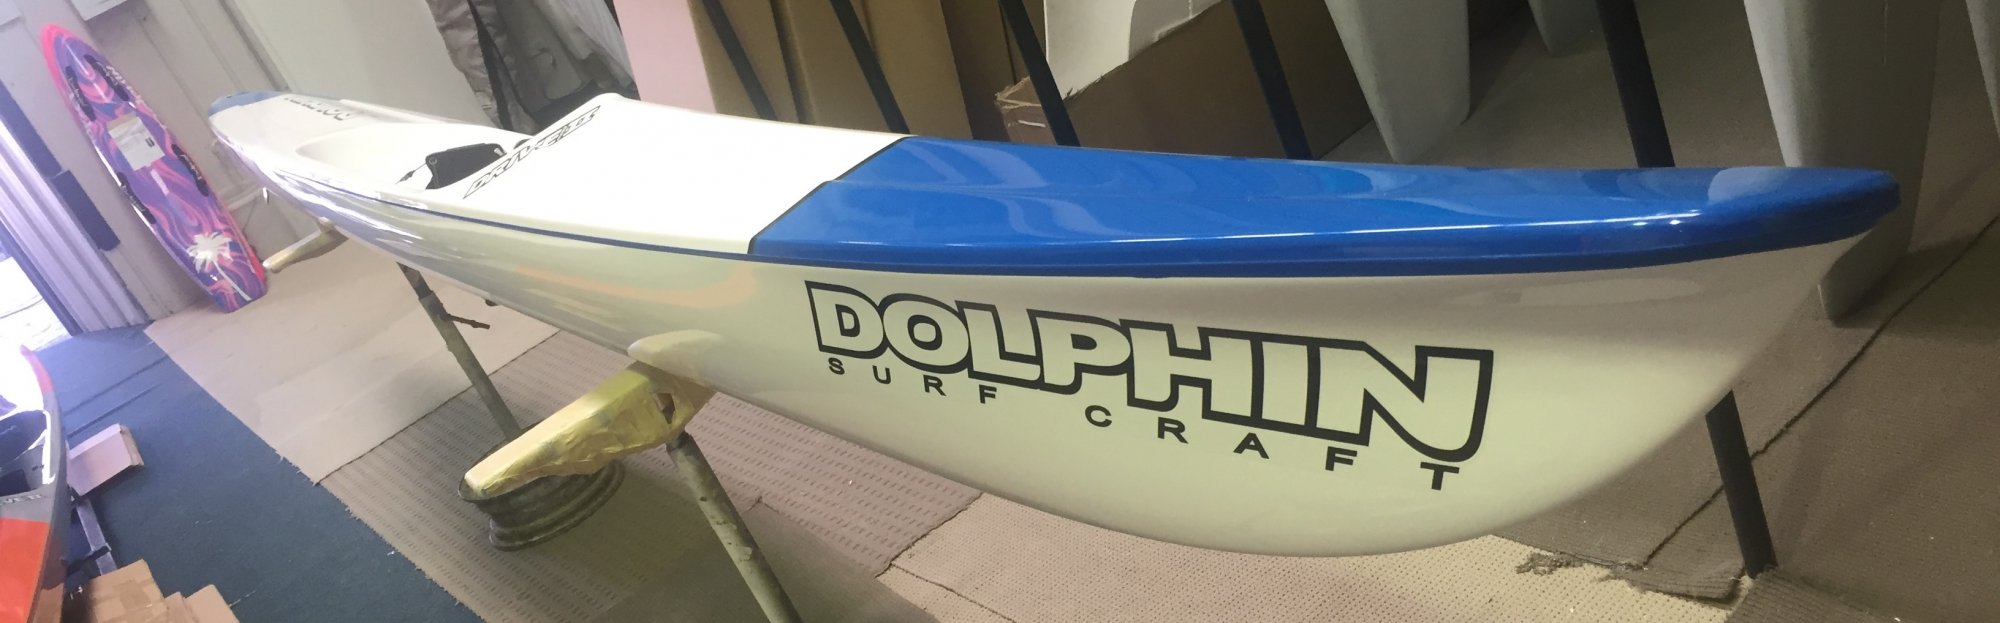 Dolphin Adjustable Drive II Surf Ski 19' -  996